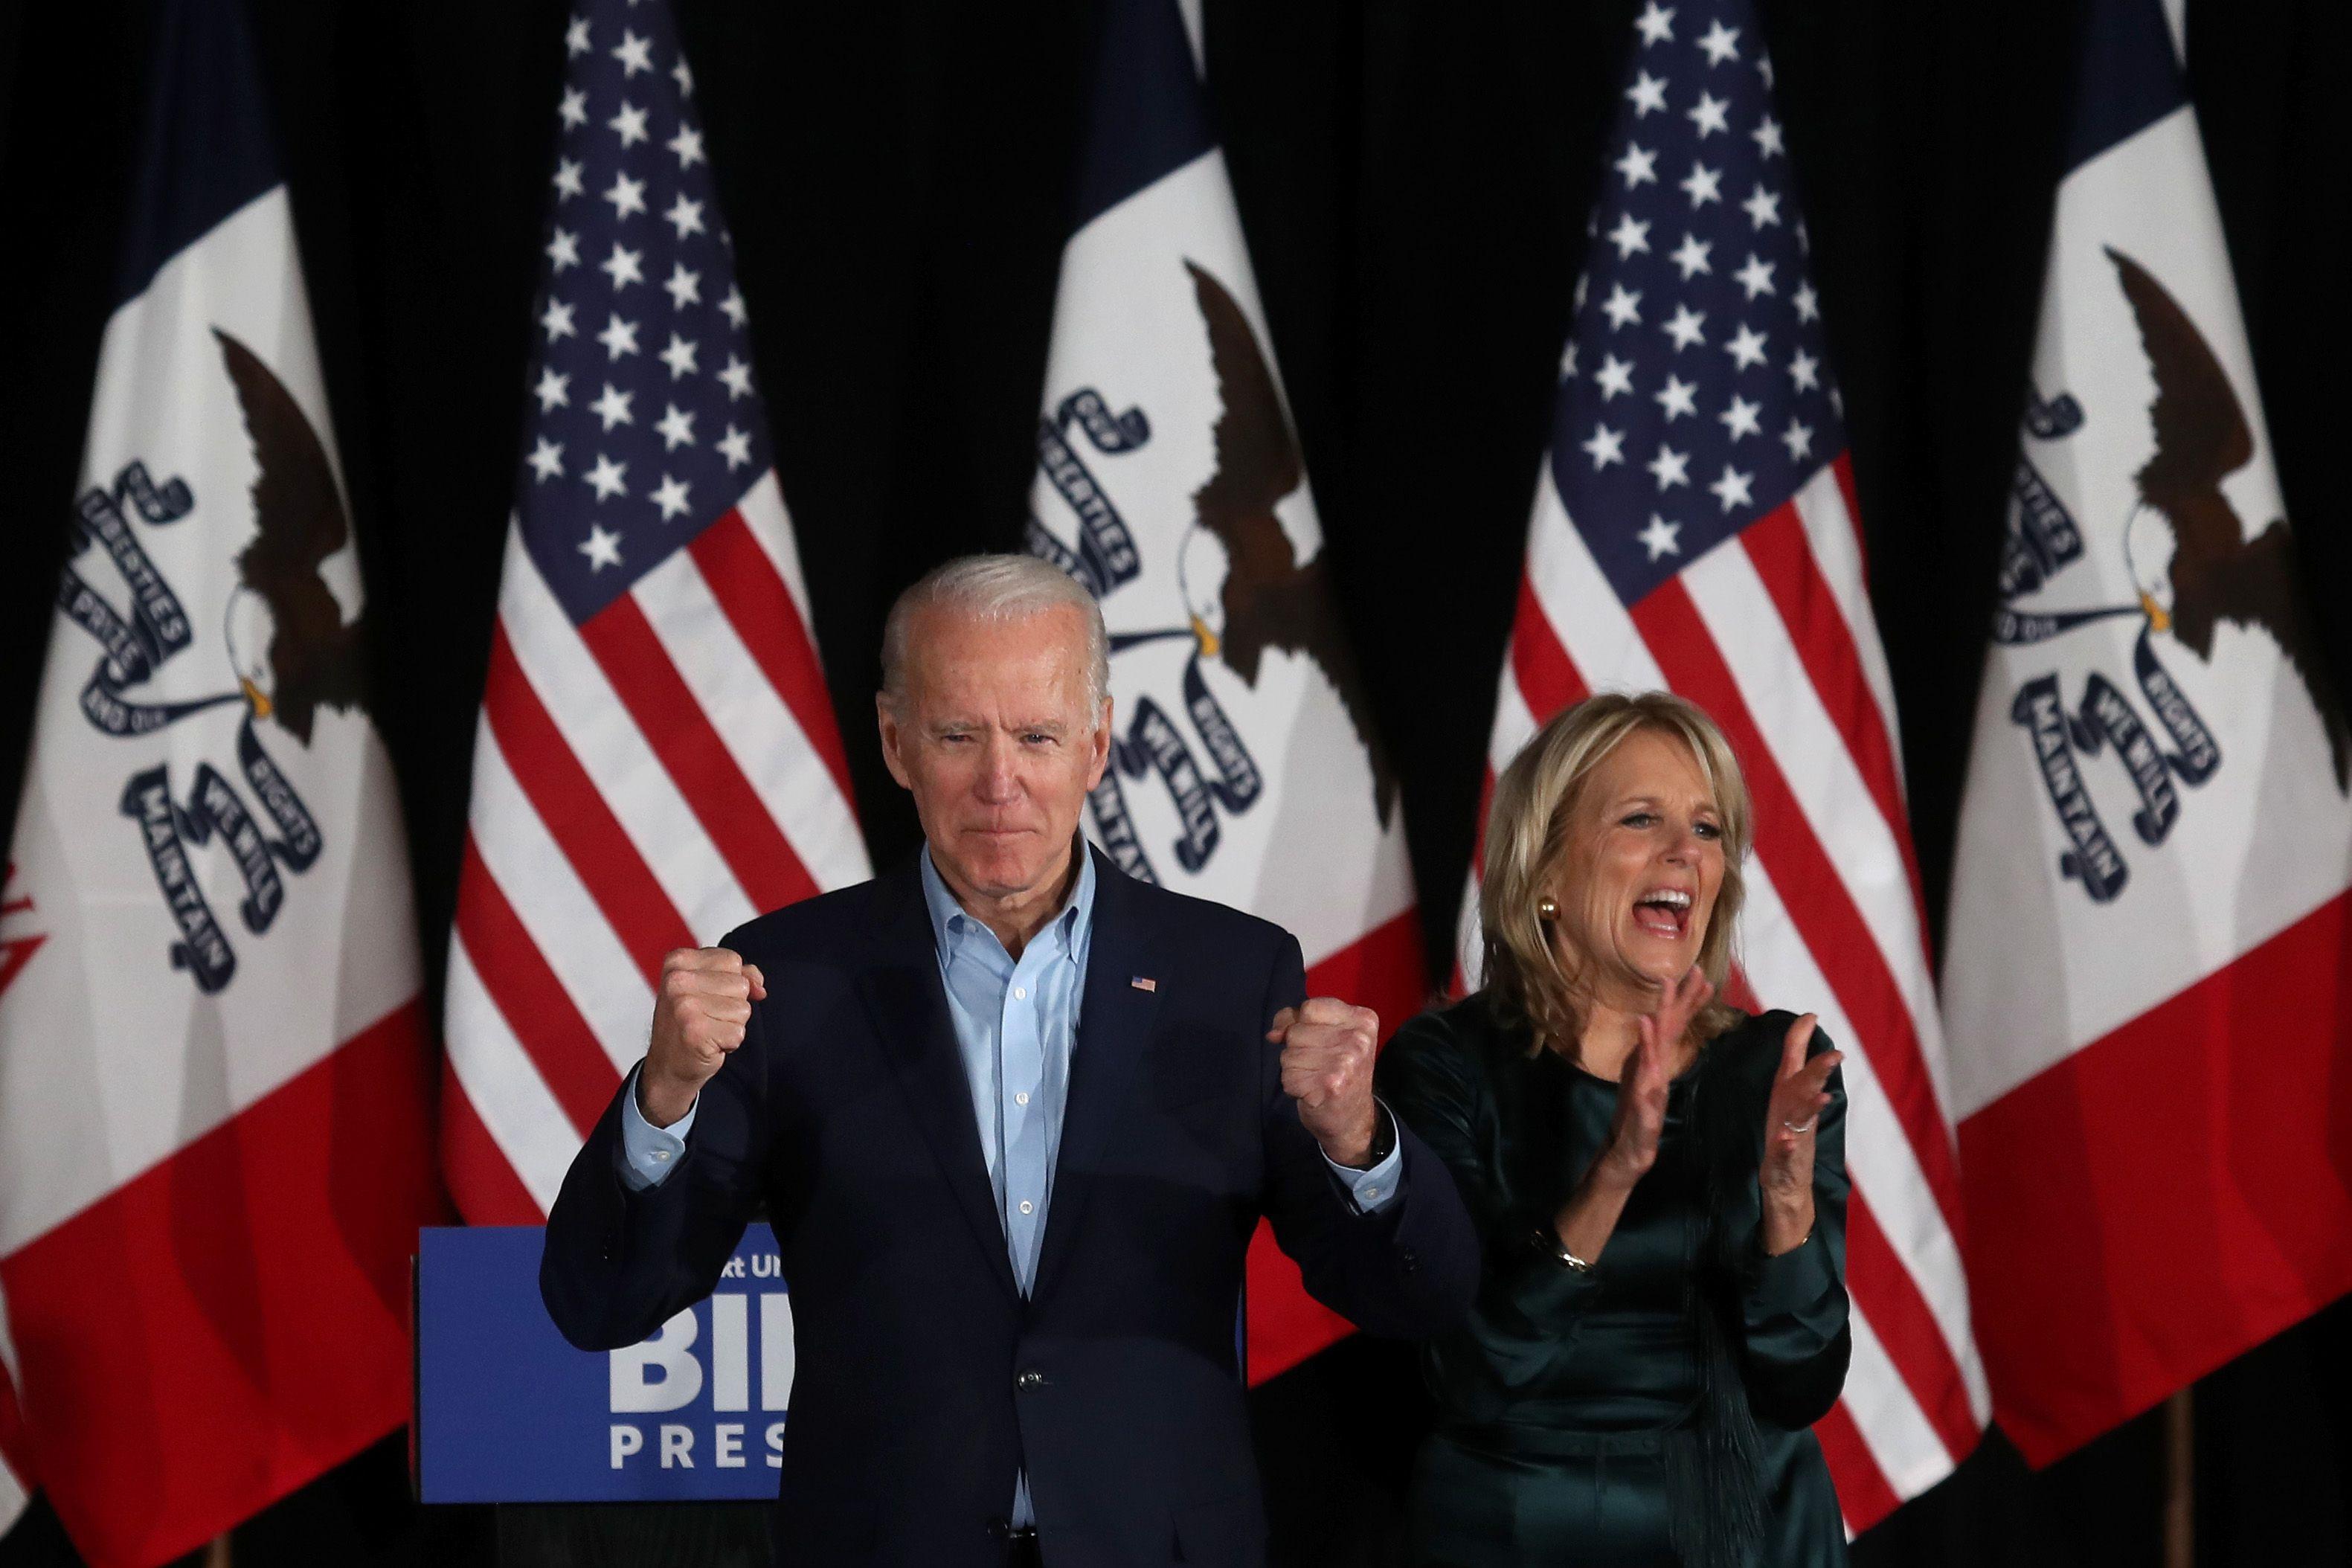 Biden endorsed for president by Caroline Kennedy - Axios